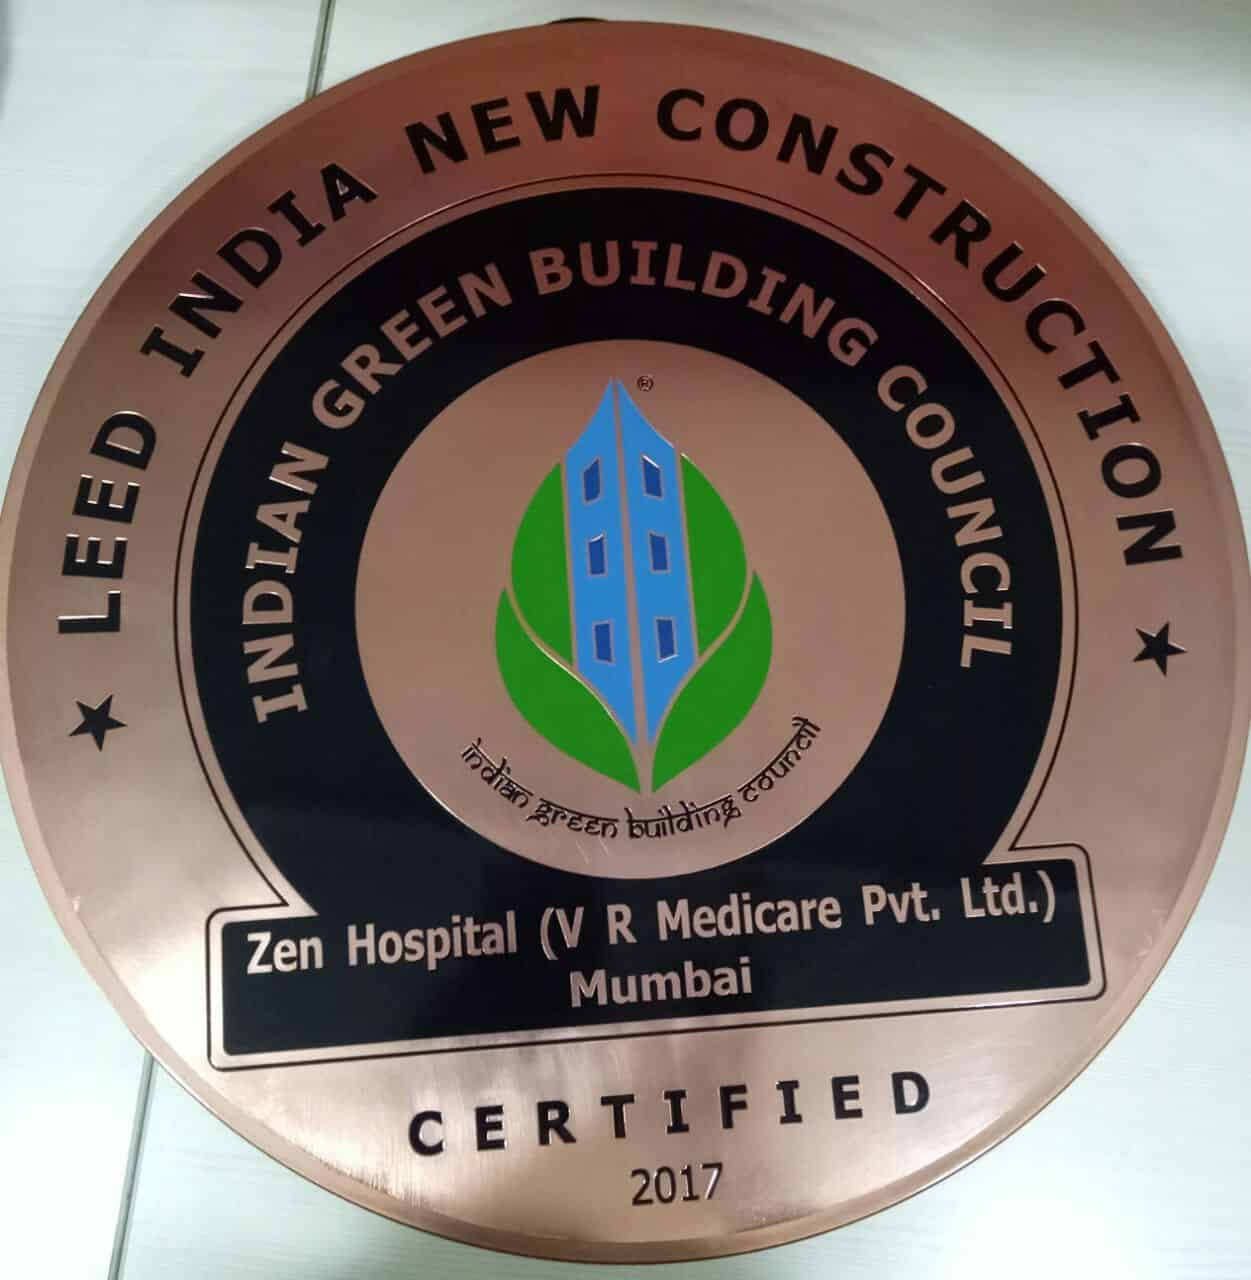 Best Multi Specialty Hospital in Mumbai - Zen Hospital